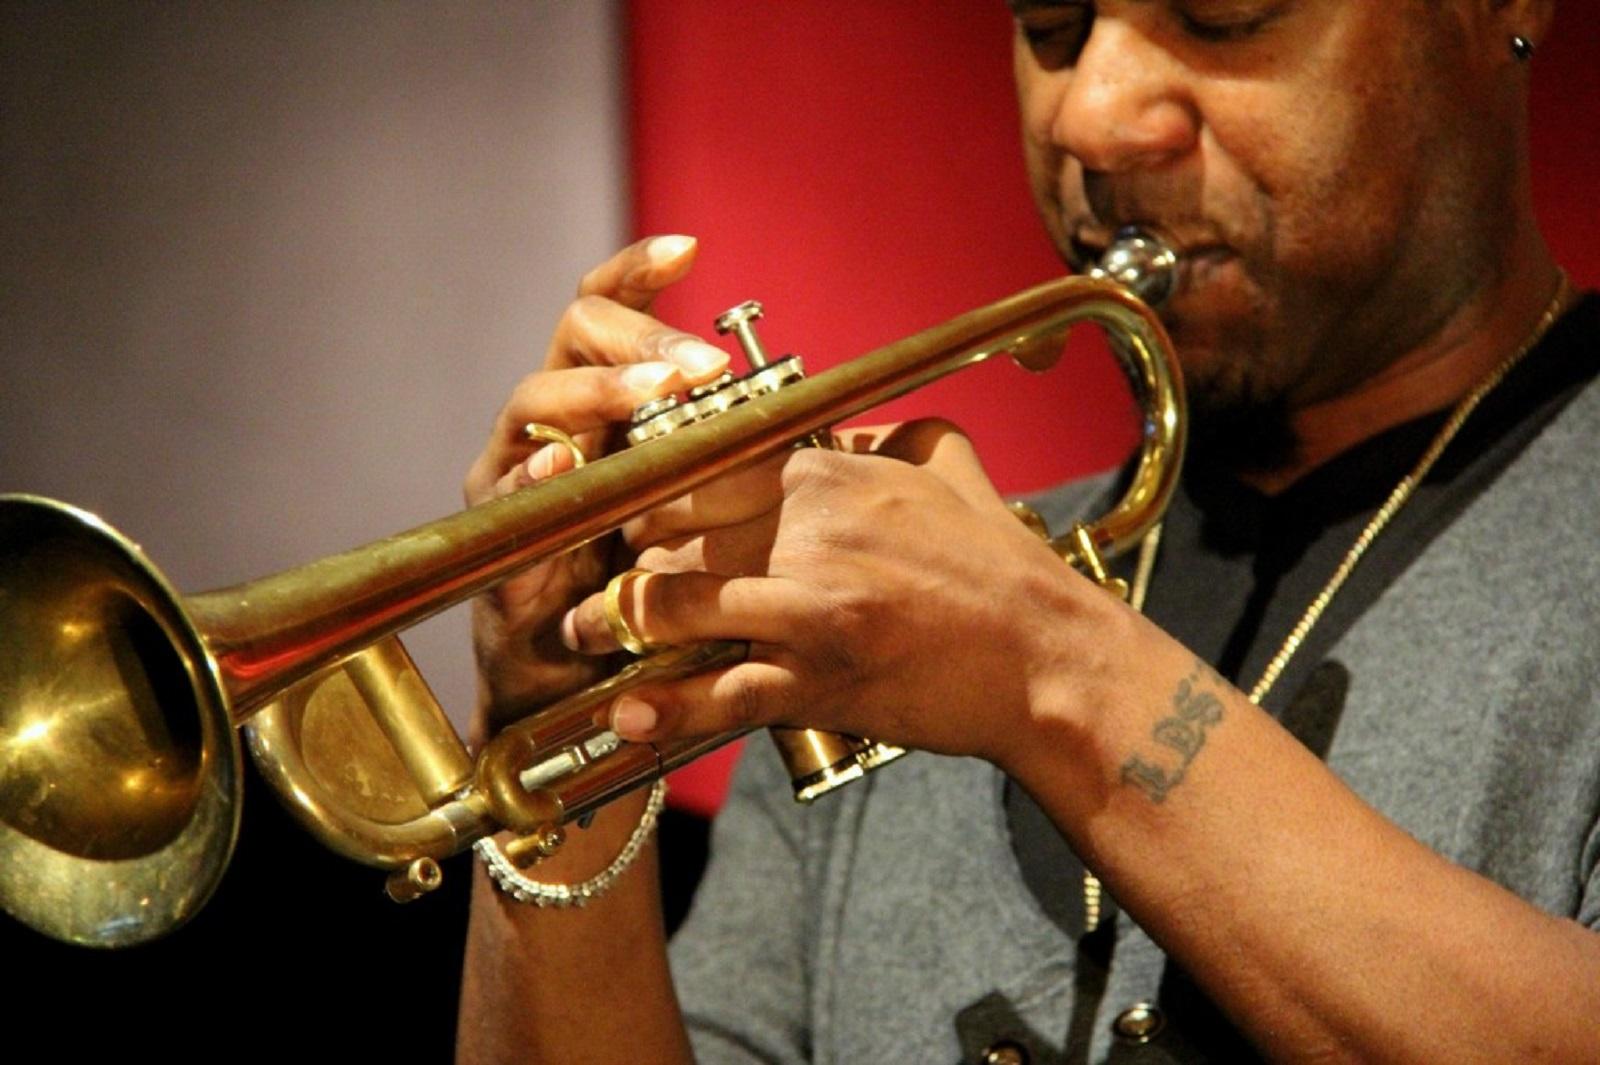 Hip-hop/jazz maestro Russell Gunn has been melting Miers' face all week long.